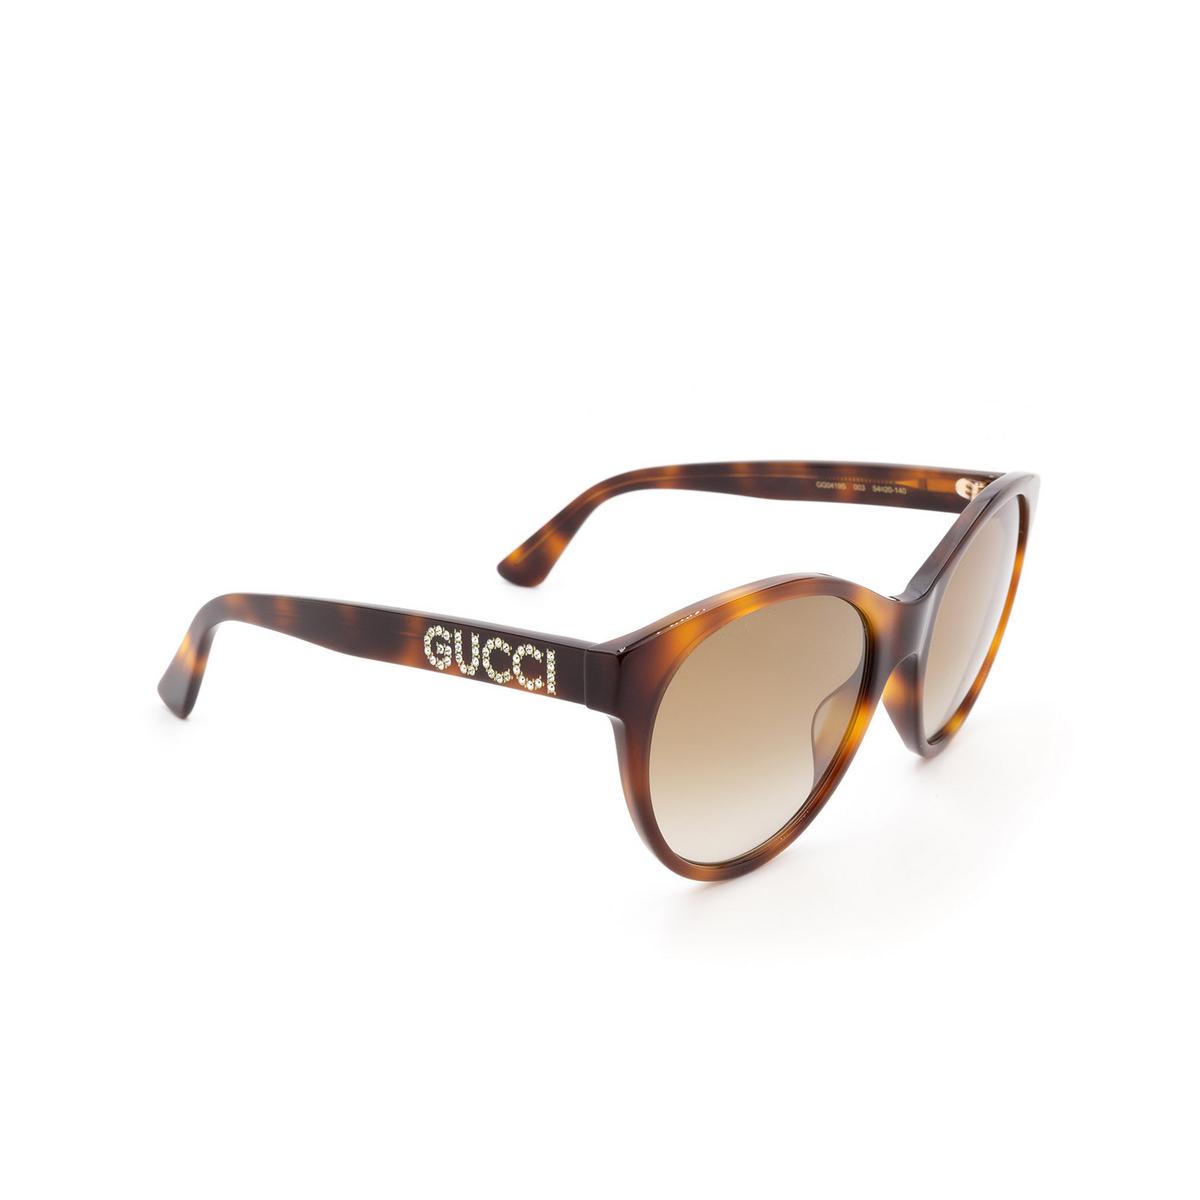 Gucci® Cat-eye Sunglasses: GG0419S color Havana 003 - 2/3.